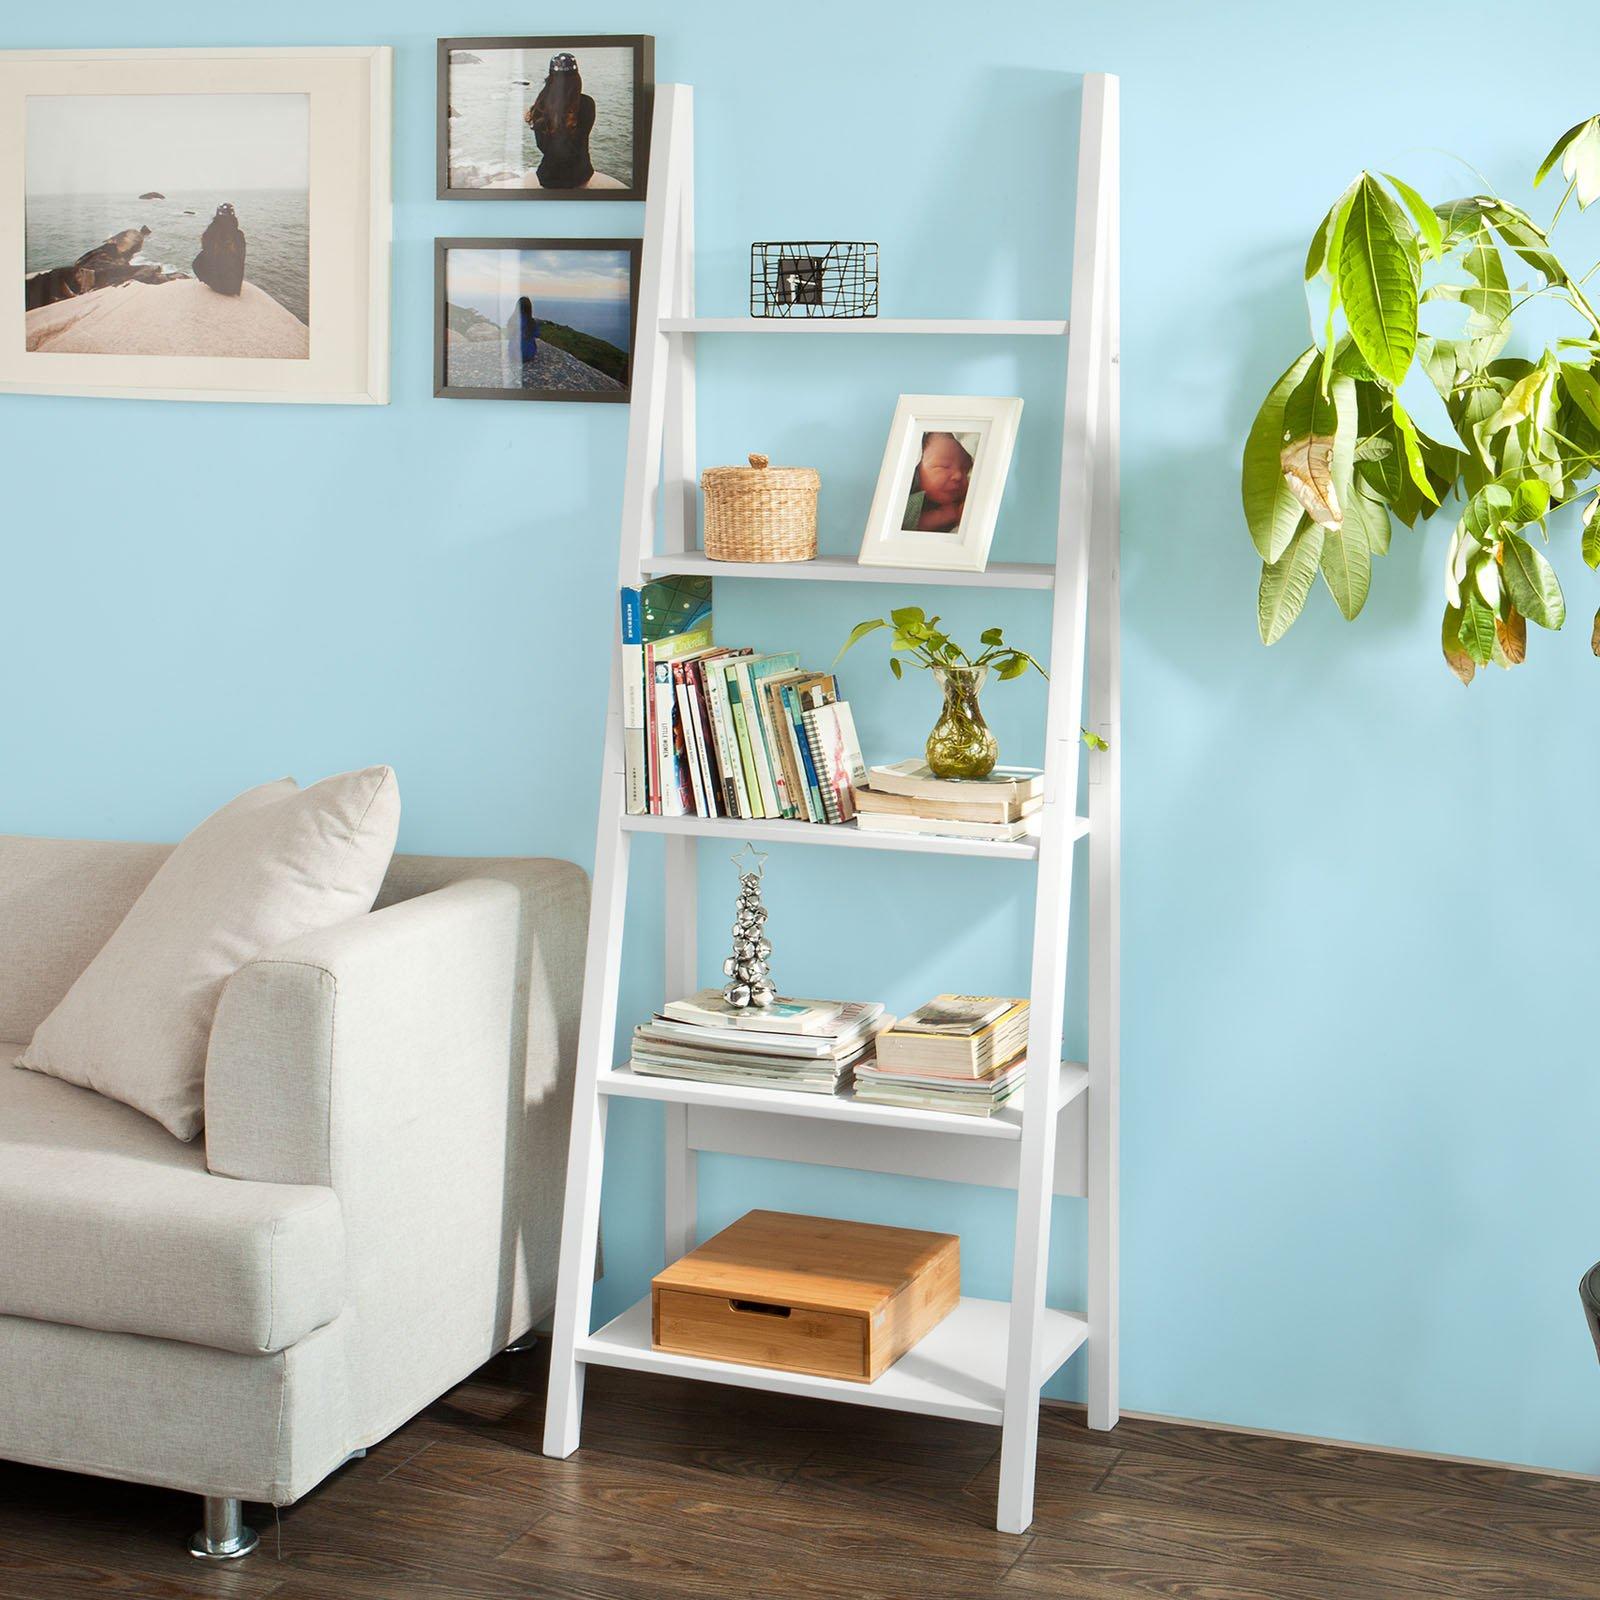 Haotian FRG61-W, Modern 5 Tiers Ladder Shelf Bookcase, Wood Storage Display Shelving, Wall Shelf, W64xD39xH180cm, White by Haotian